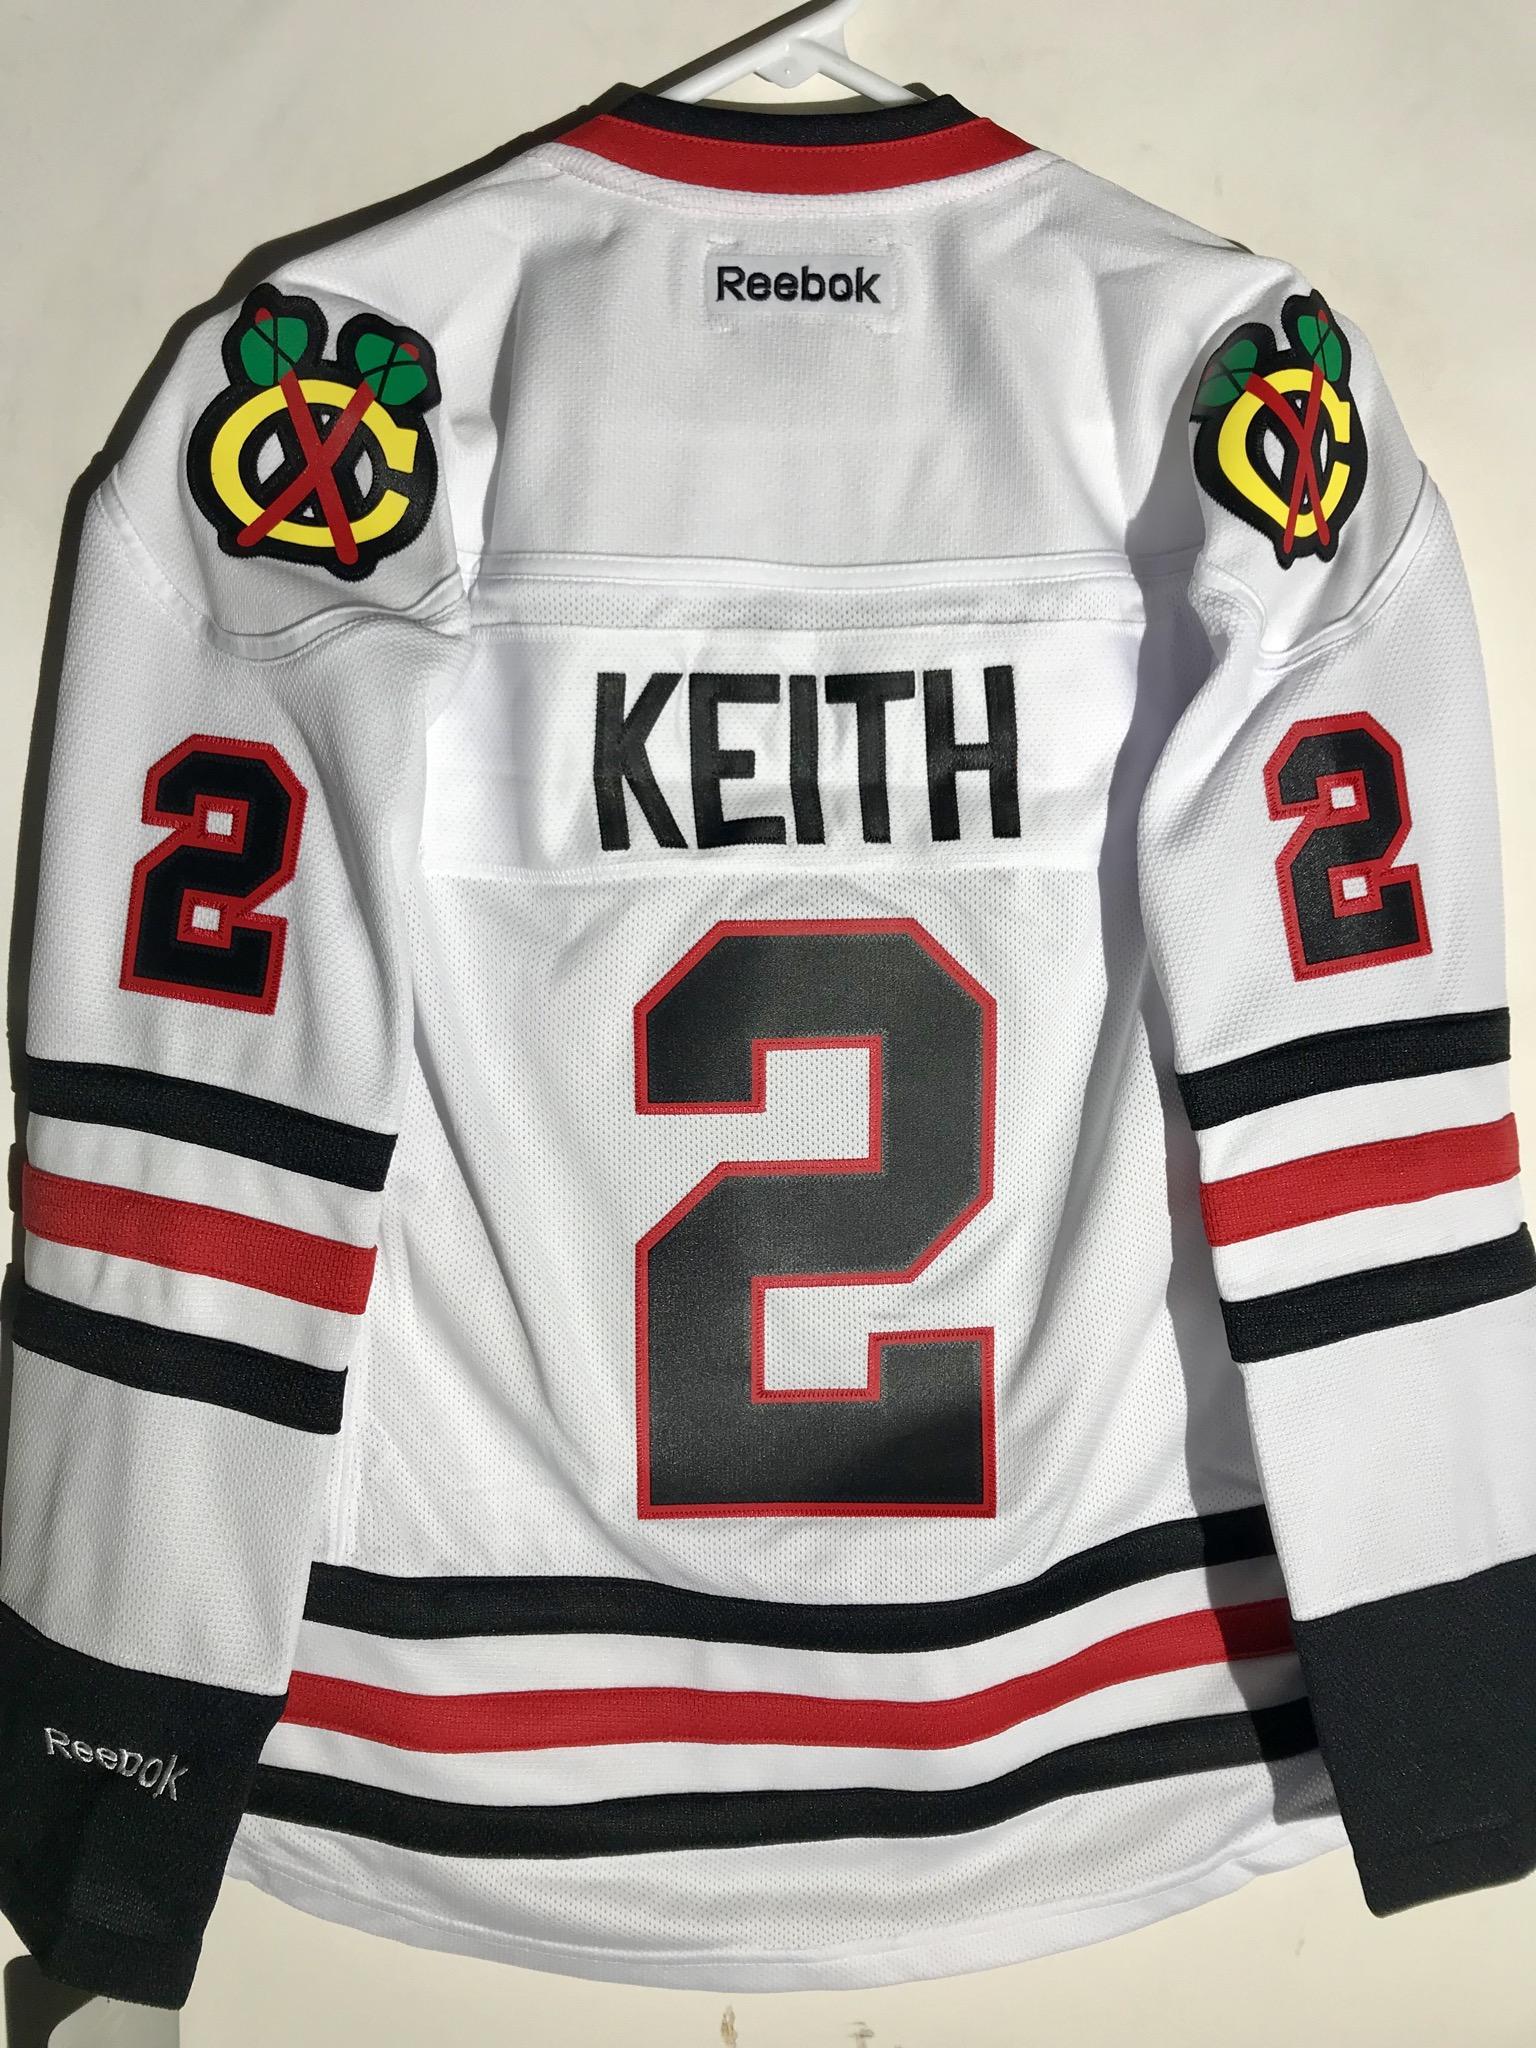 Reebok Women s Premier NHL Jersey Chicago Blackhawks Duncan Keith ... eb68d7de6